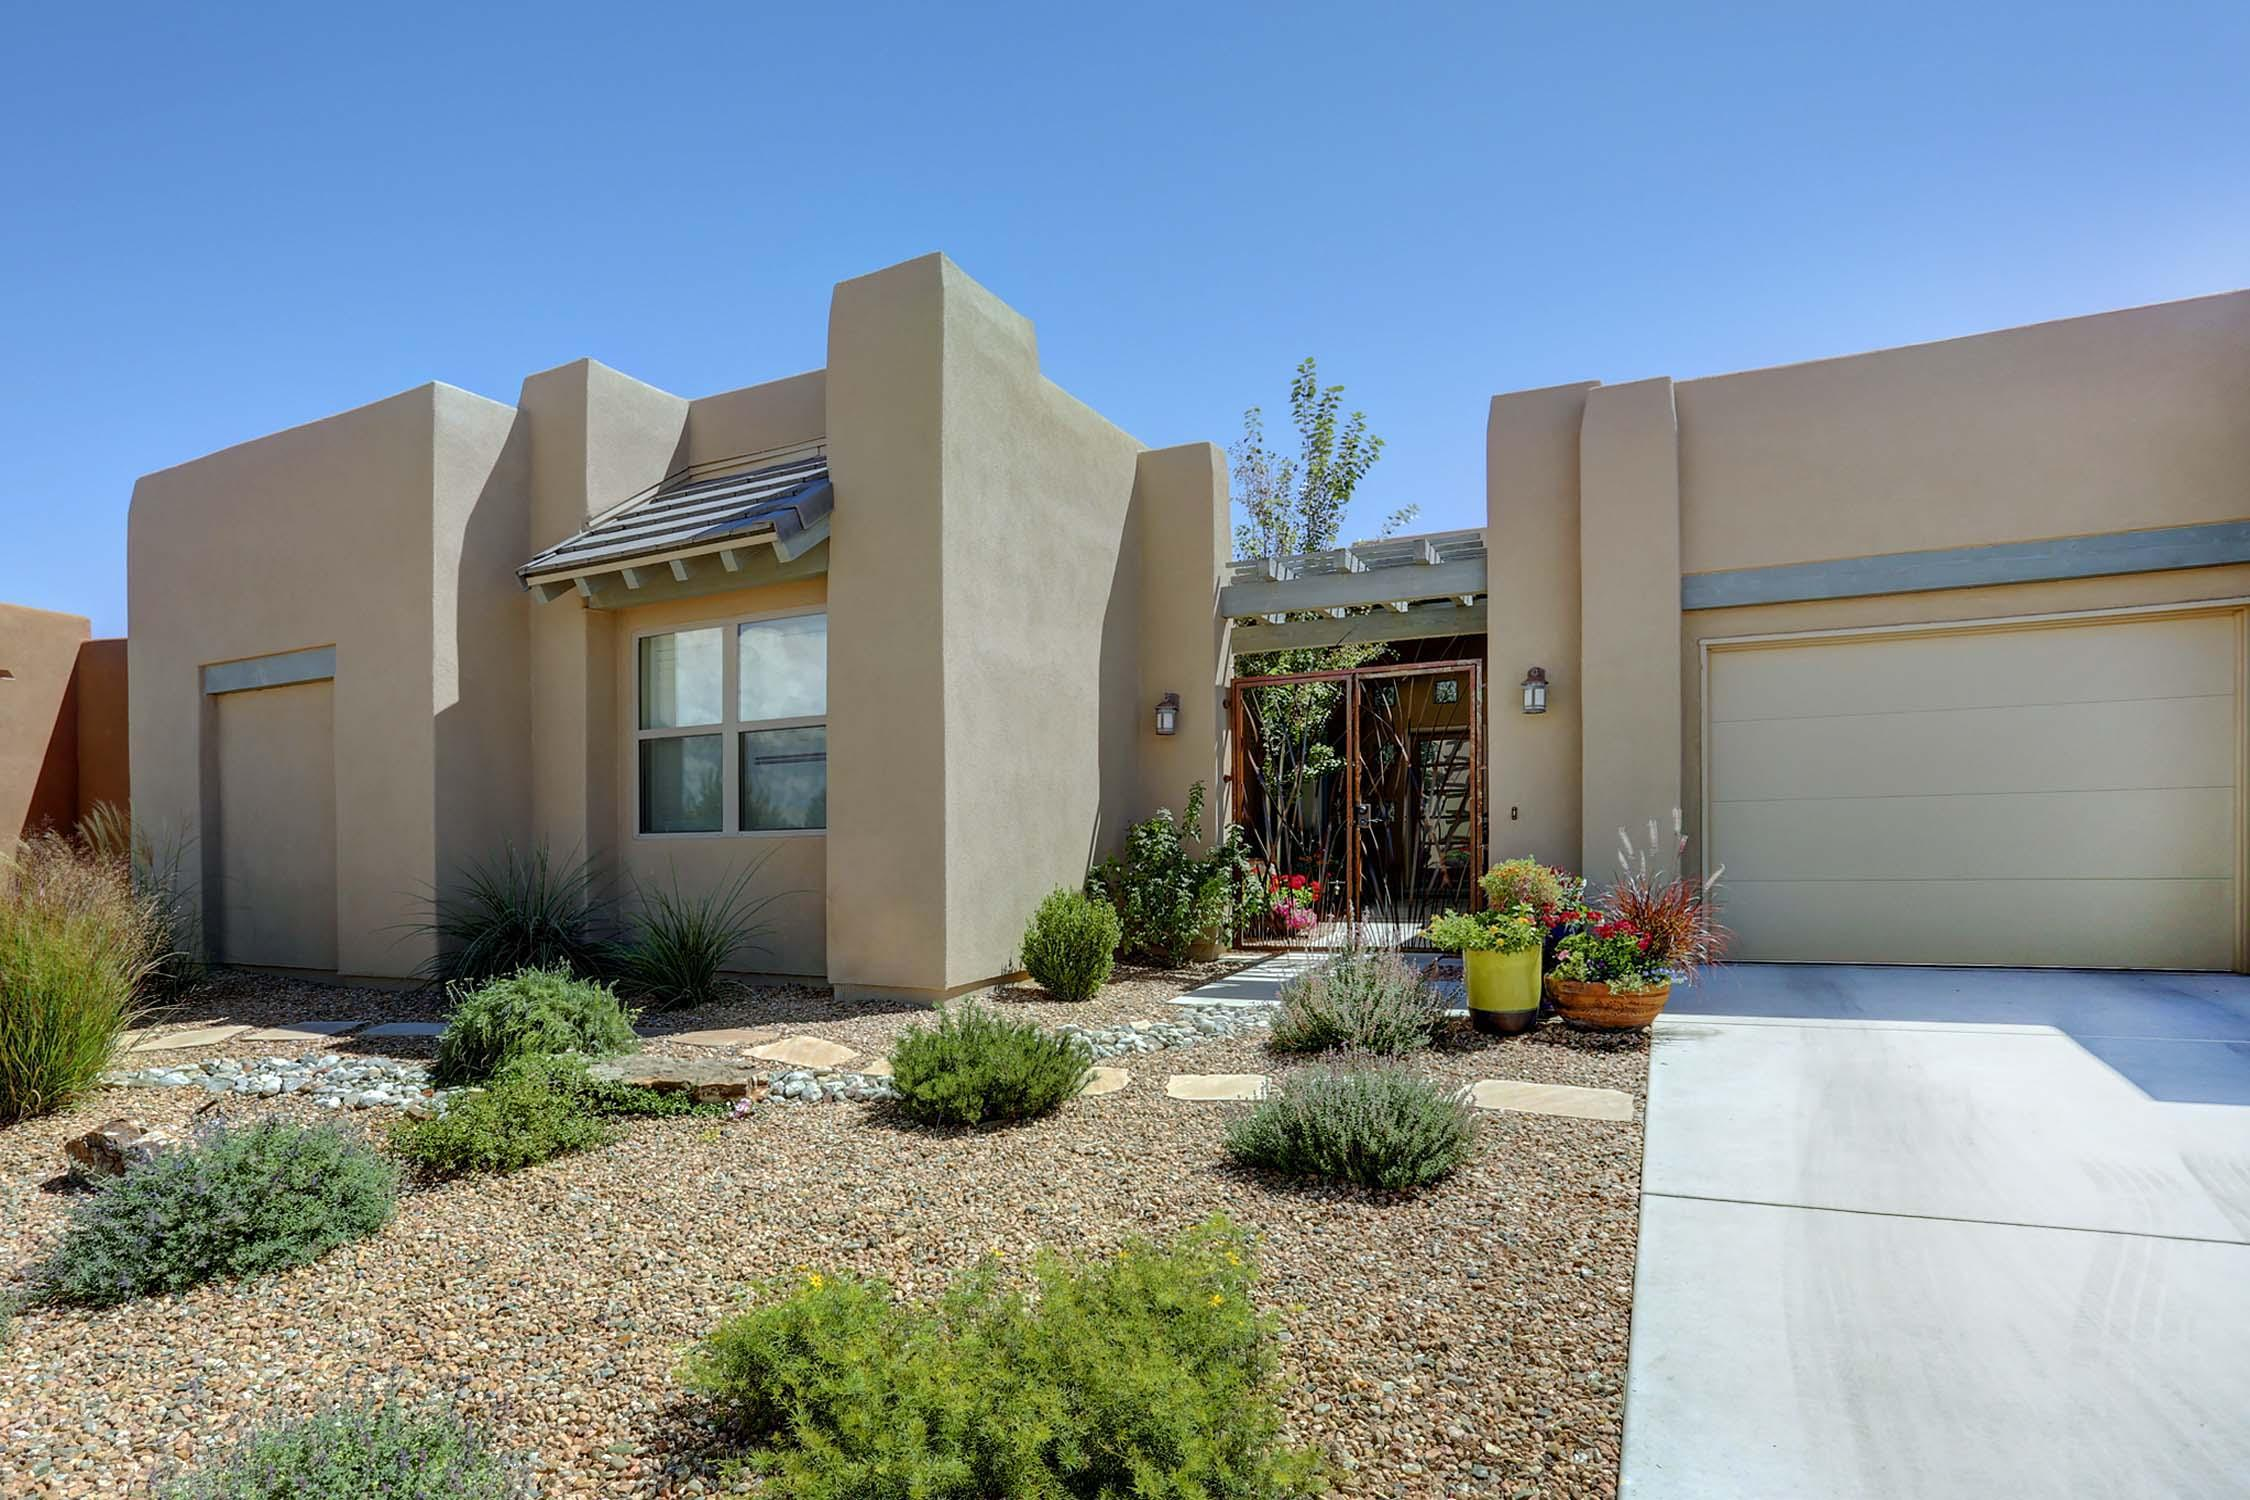 Upcoming albuquerque area open houses venturi realty group for Southwest homes com